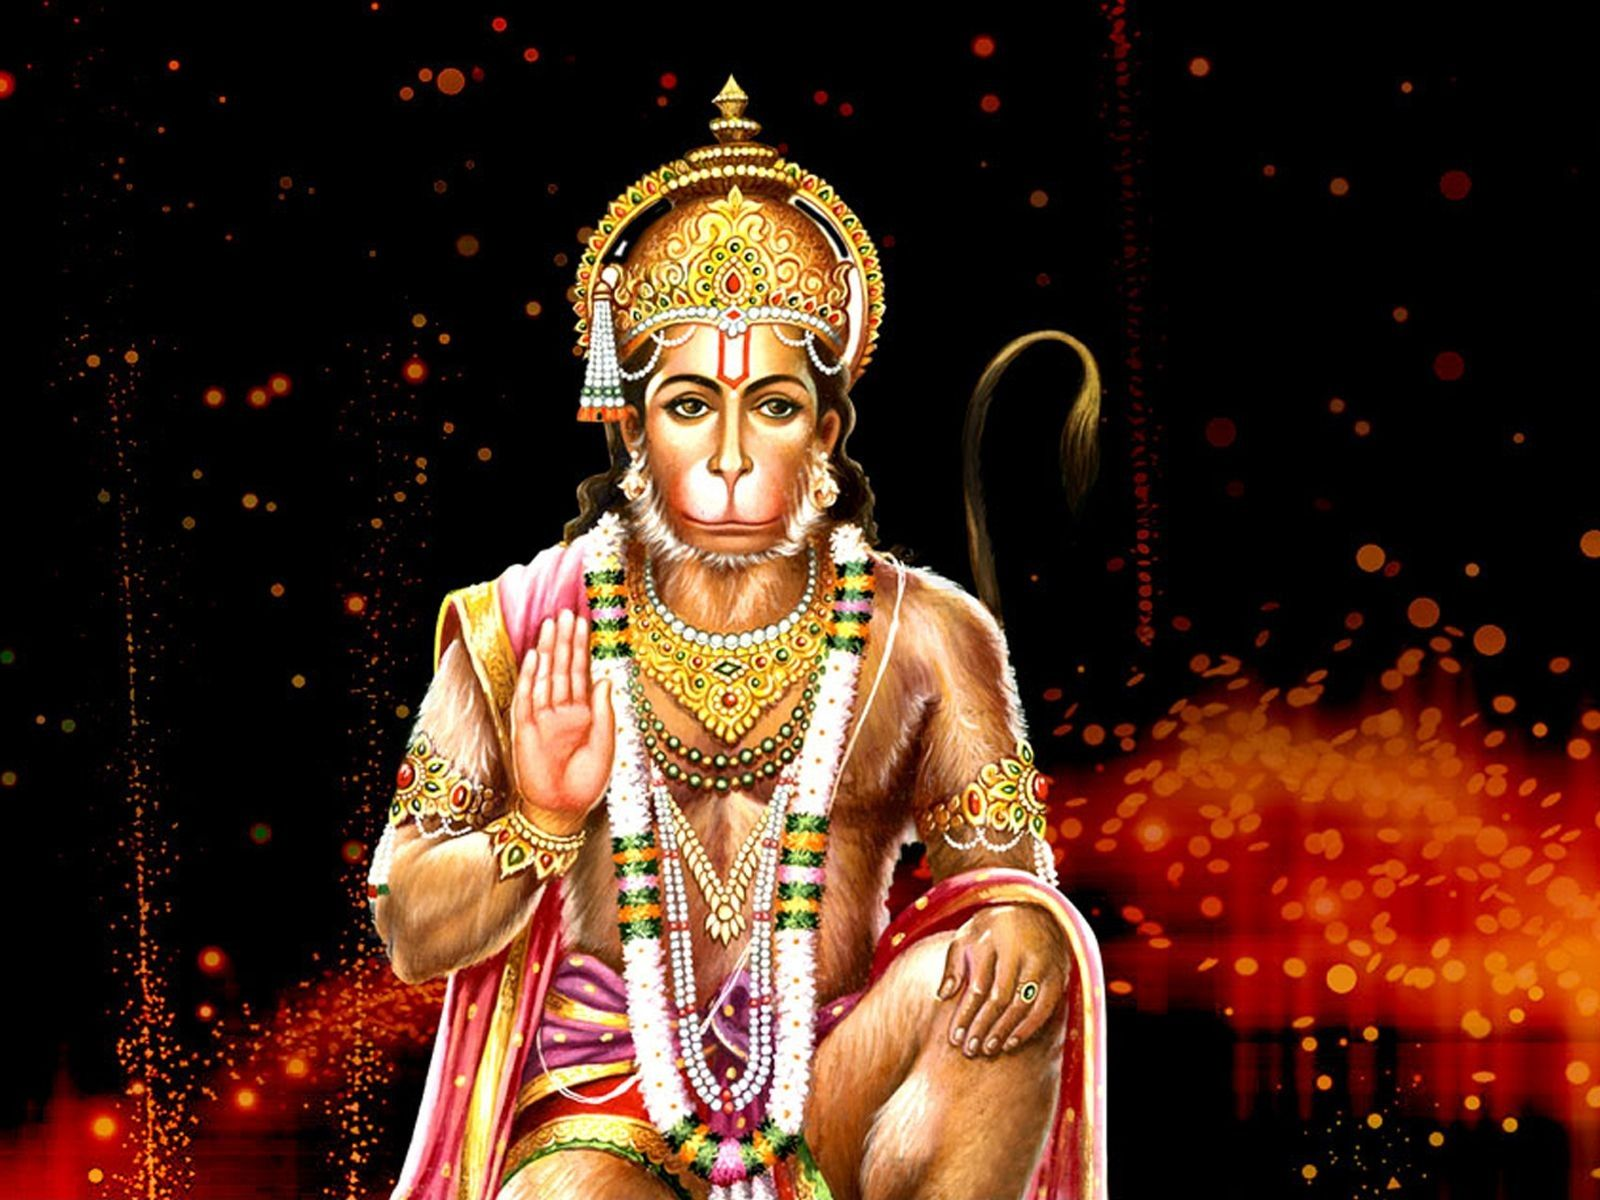 Shri Hanuman Ji Full Size Hd Pictures U2013 Latest Festival Wishes And Hanuman Anjaneya Durga Images